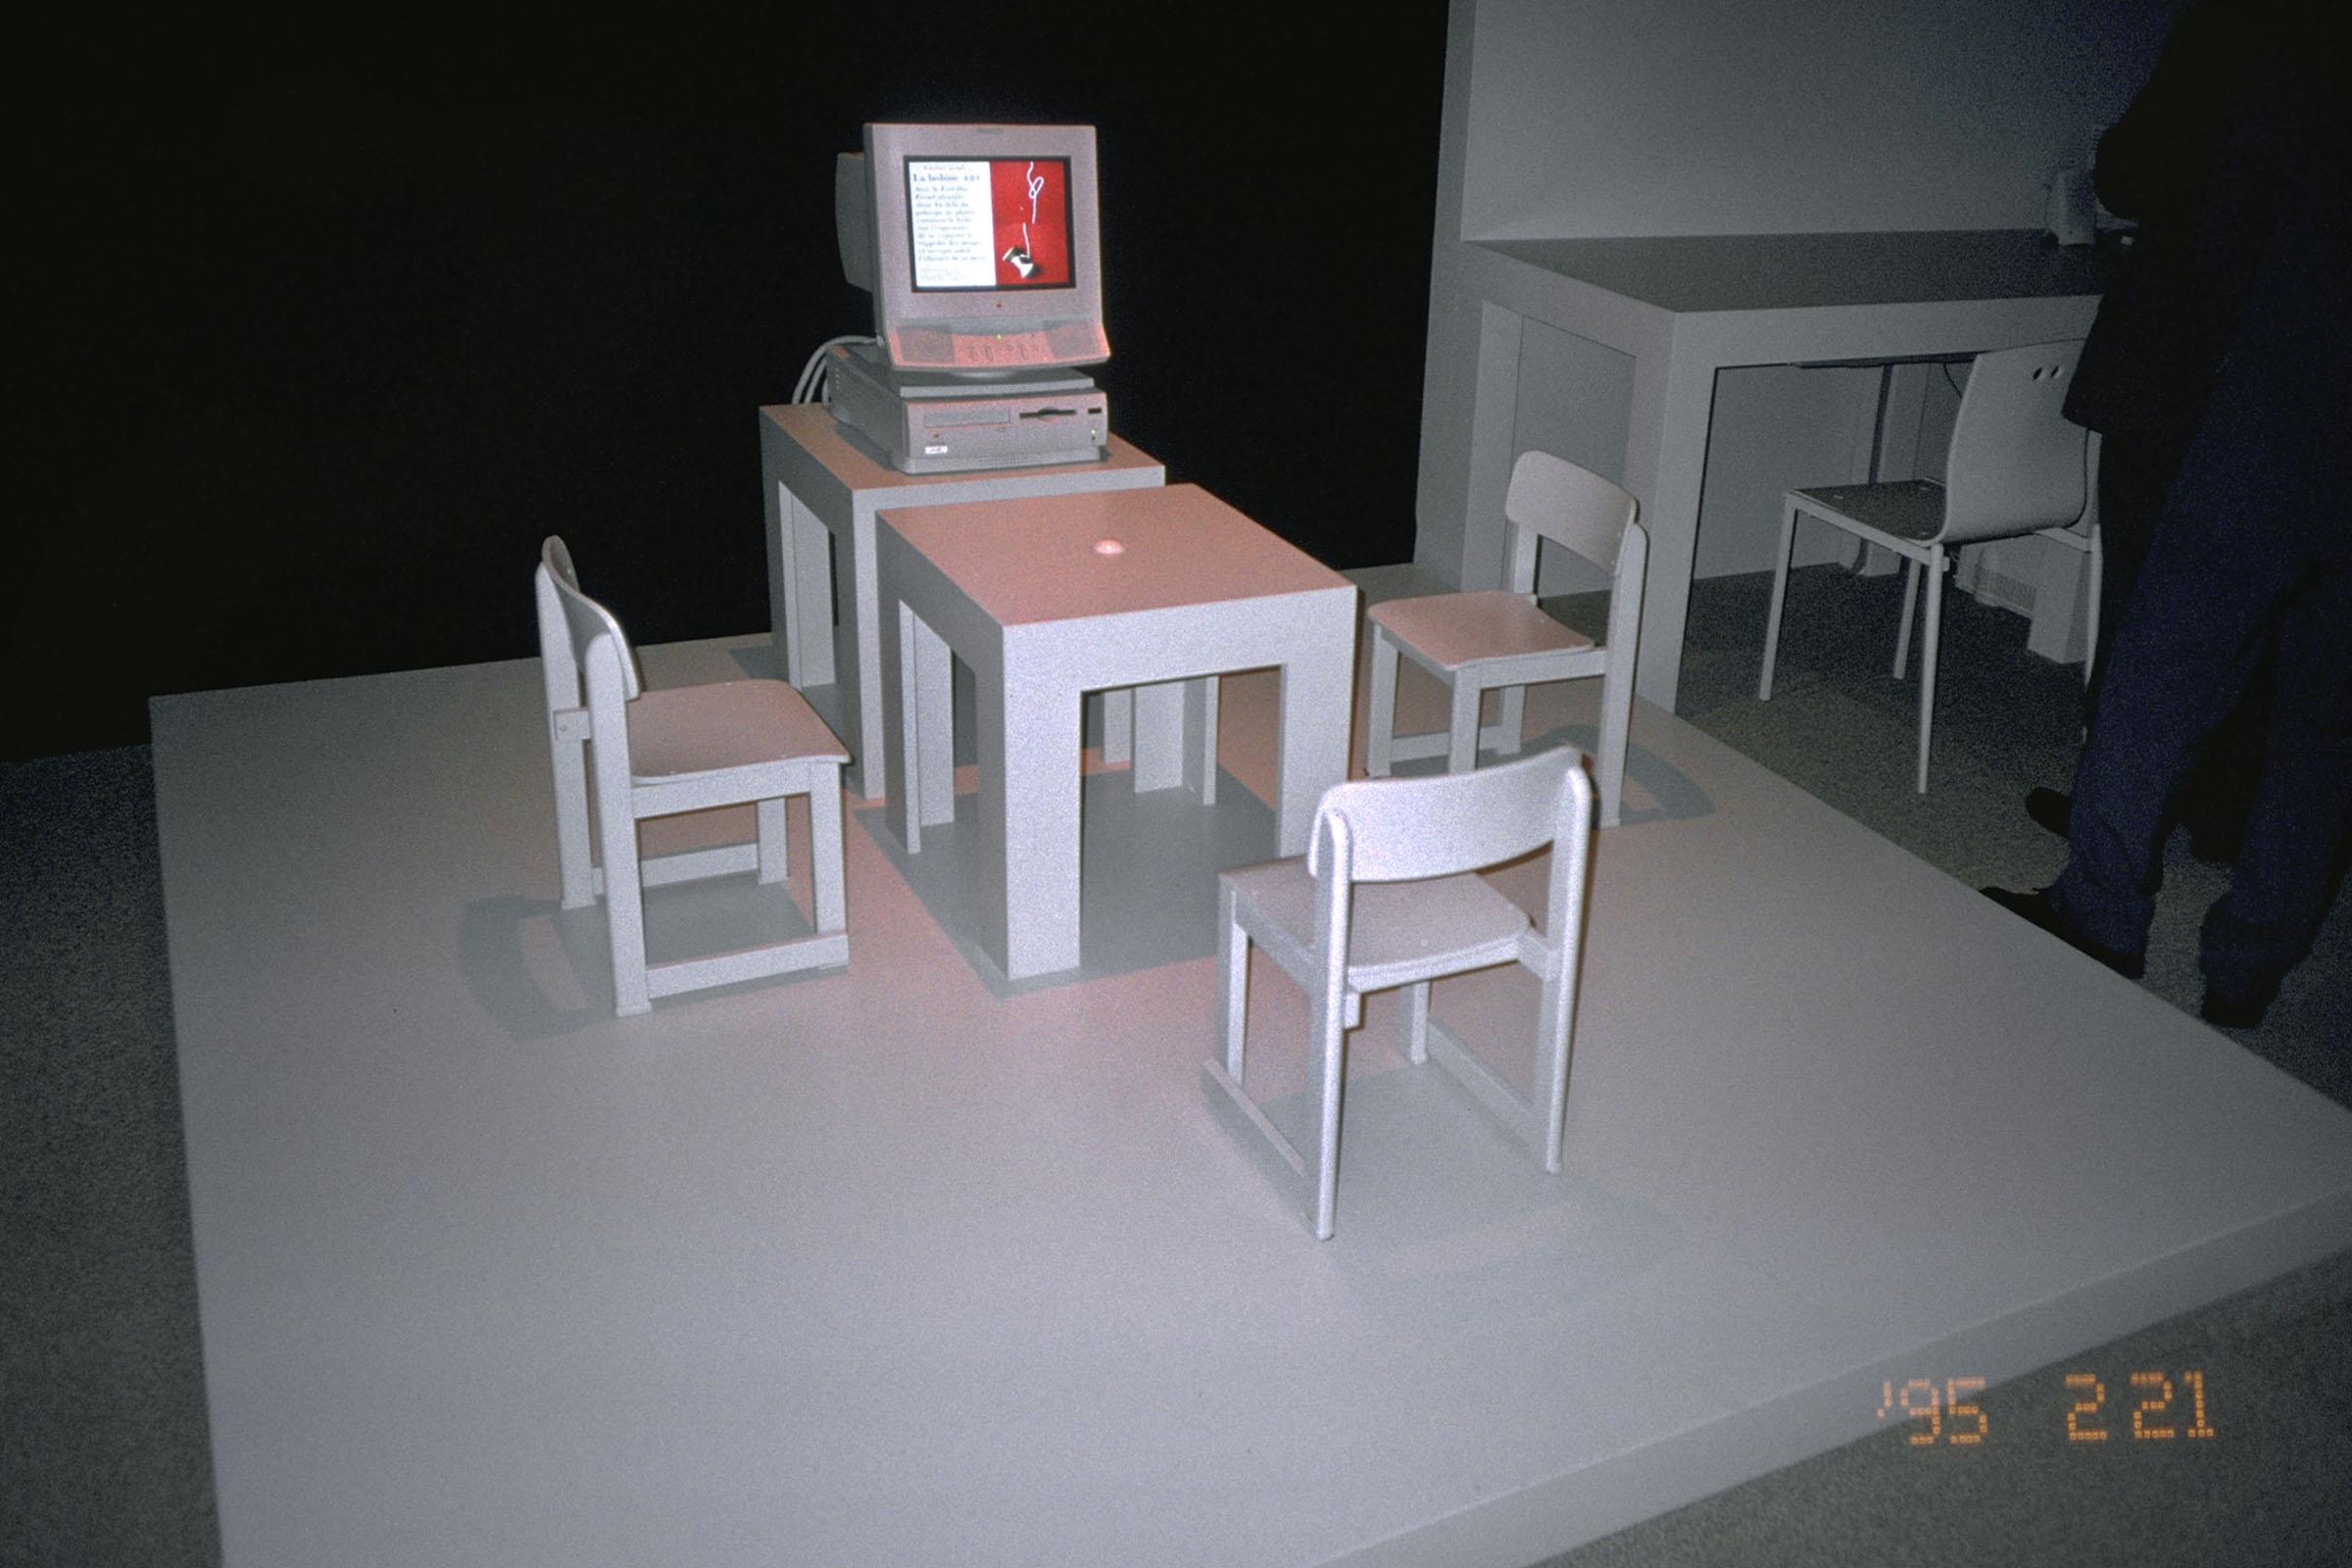 boissier-globus-oculi-1992-1995-site